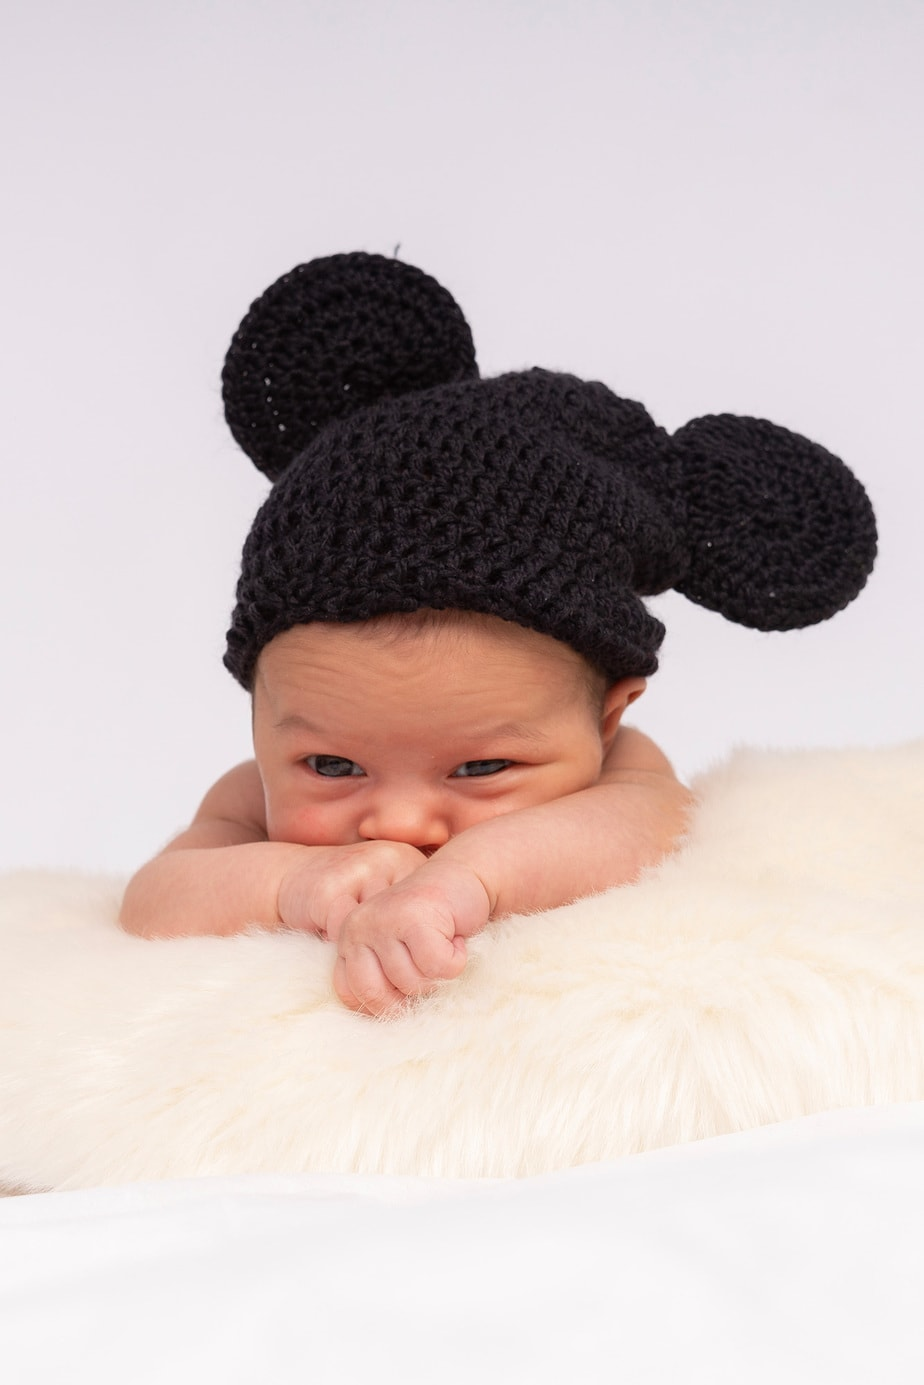 Neugeborenenfotografie im Studio